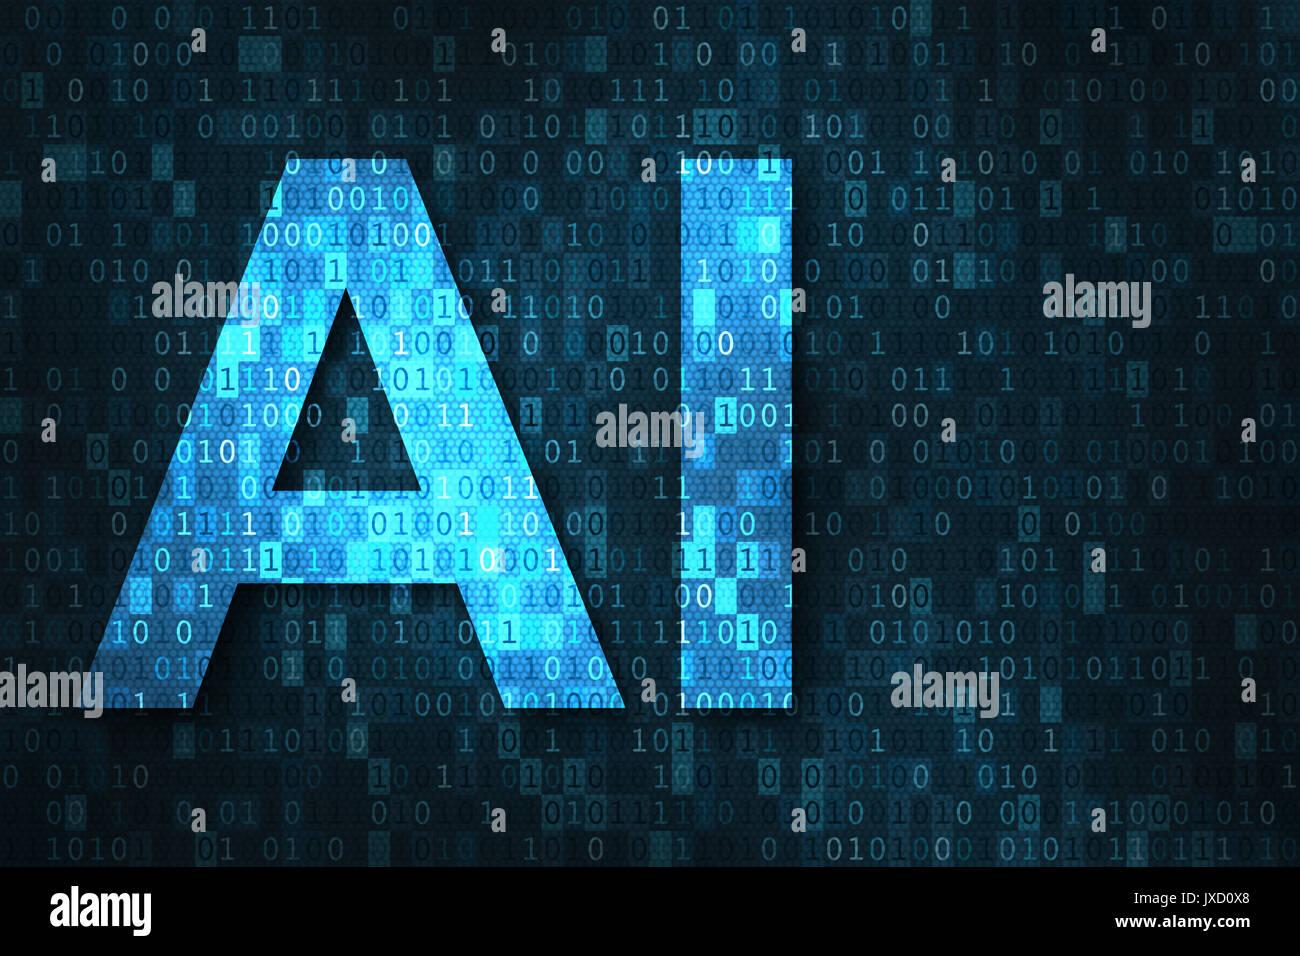 Ilustración de Inteligencia artificial AI con texto azul sobre fondo de matriz de código binario. Concepto abstracto de la tecnología cibernética y automatización Imagen De Stock